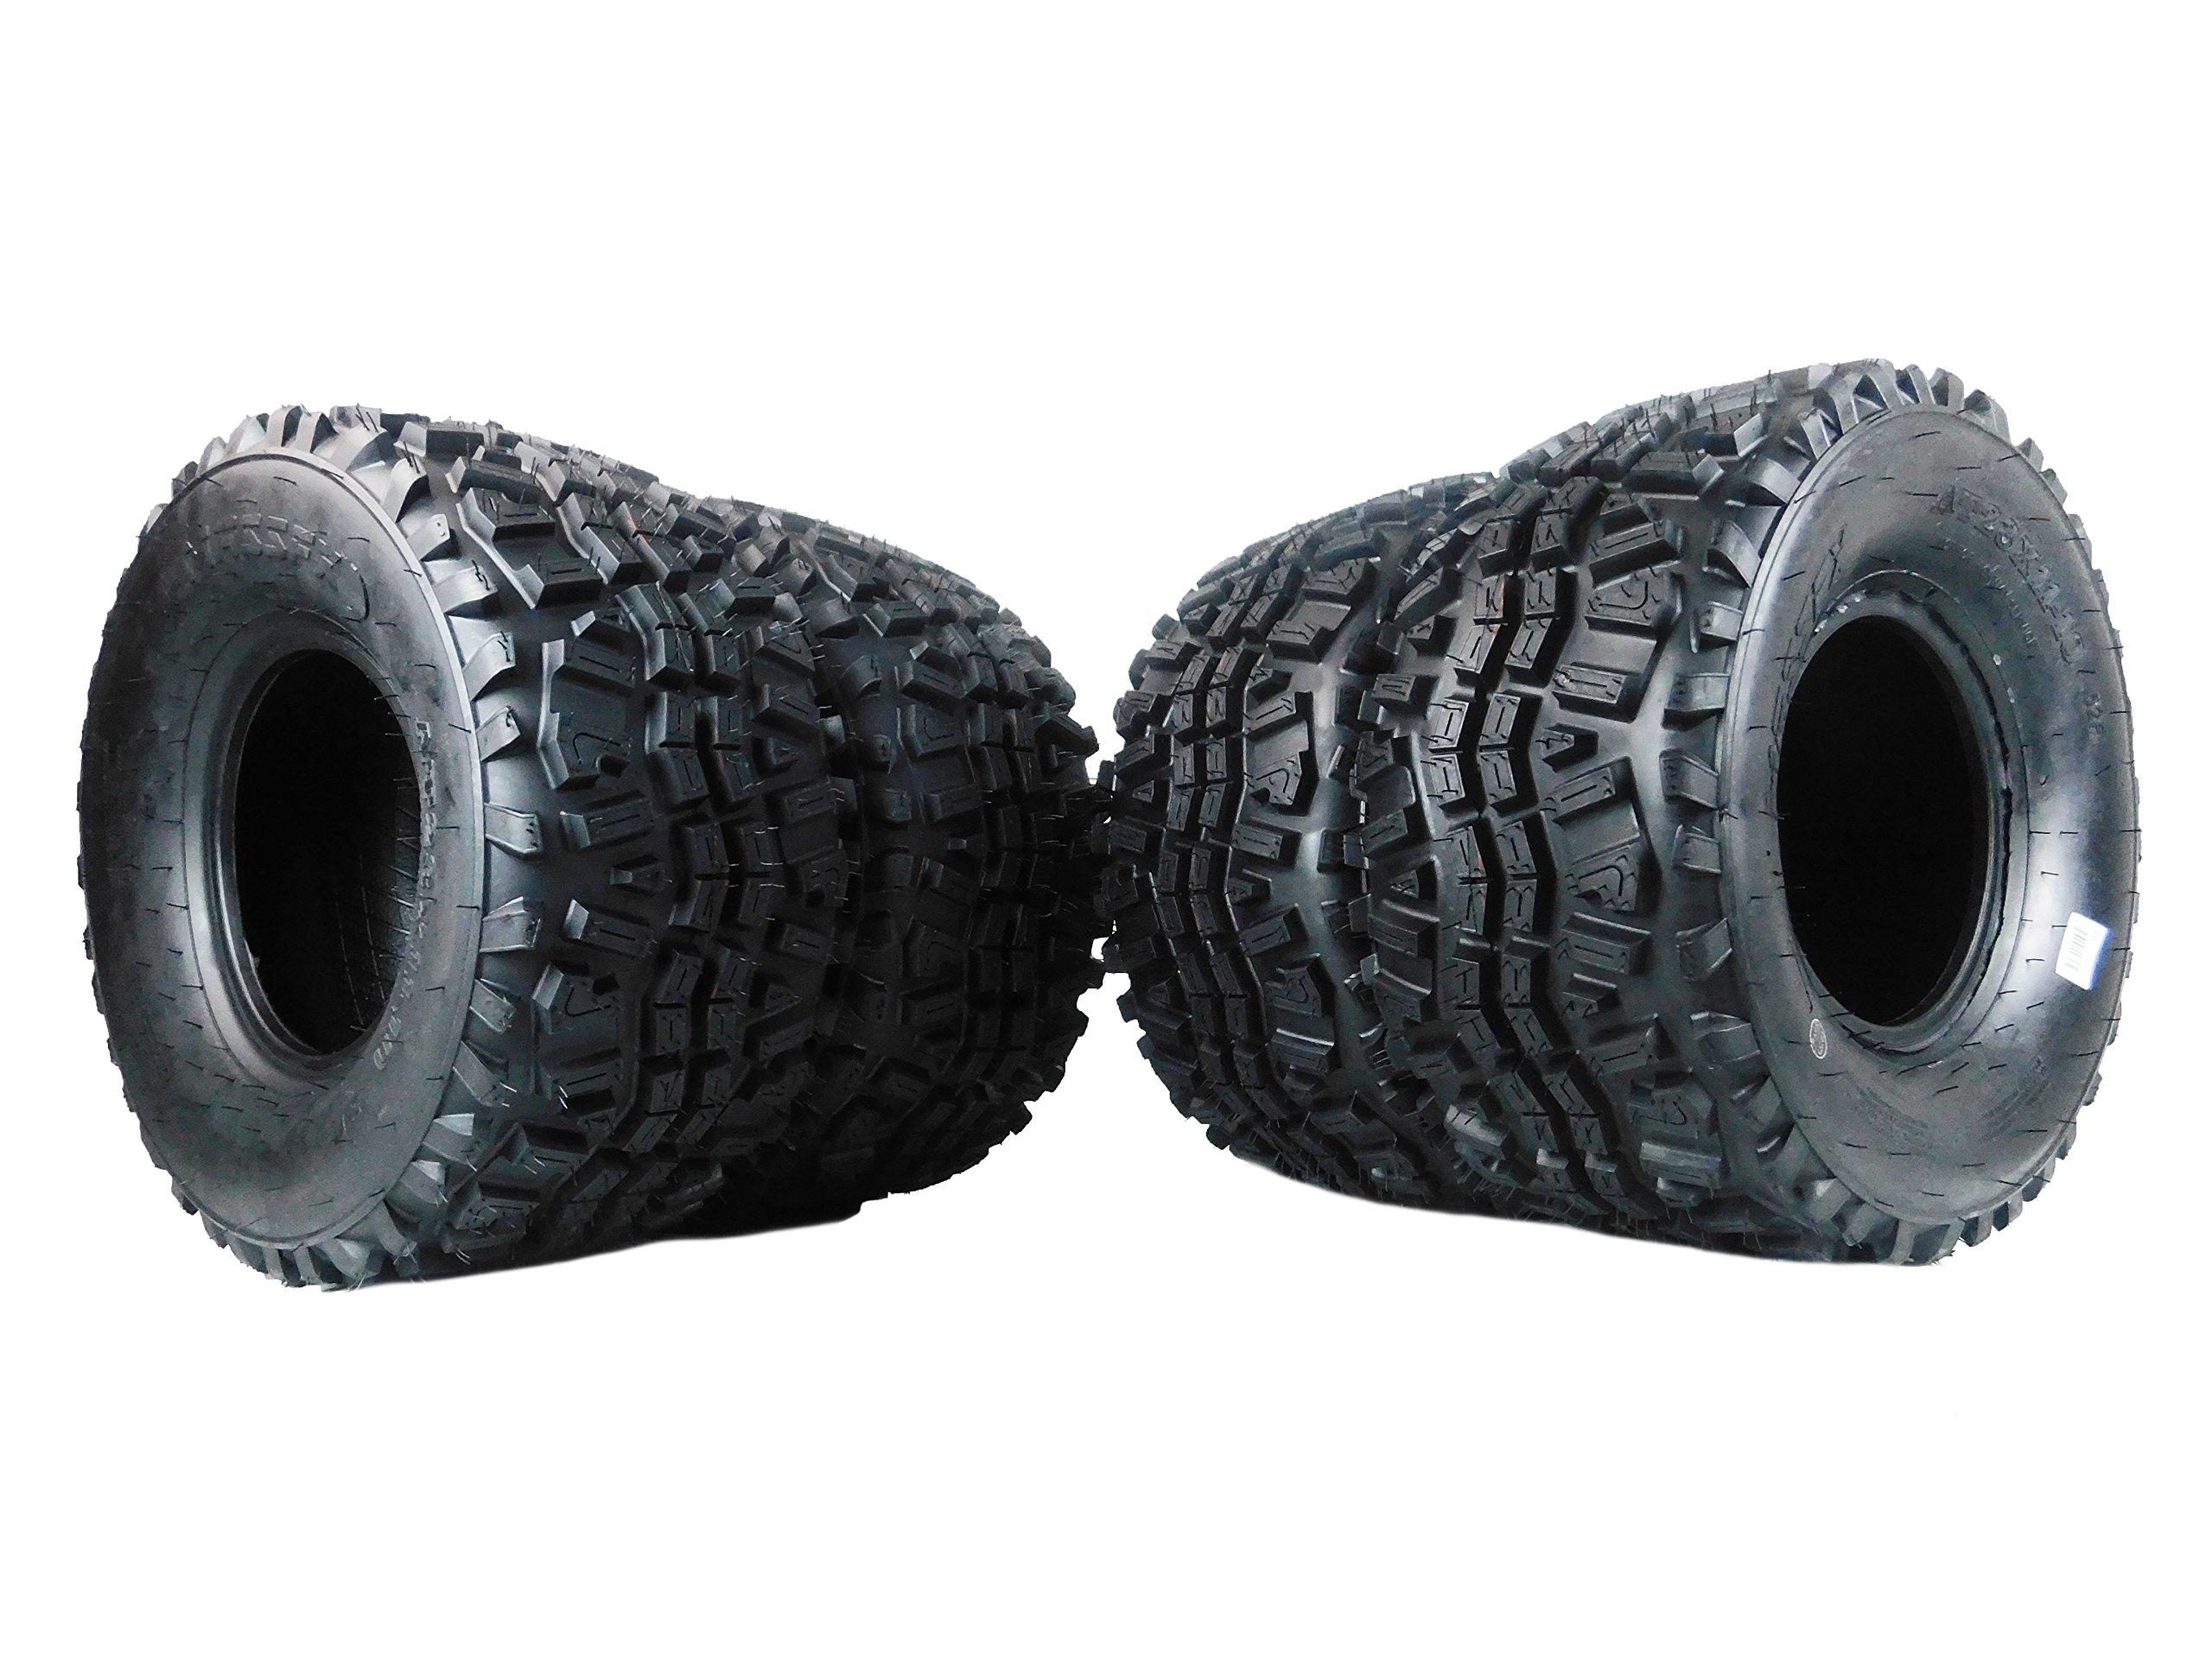 New MASSFX VS231110 ATV Tires 23X11X10 23x11-10 OEM Kawasaki Mule Tires 6 Ply 4 set